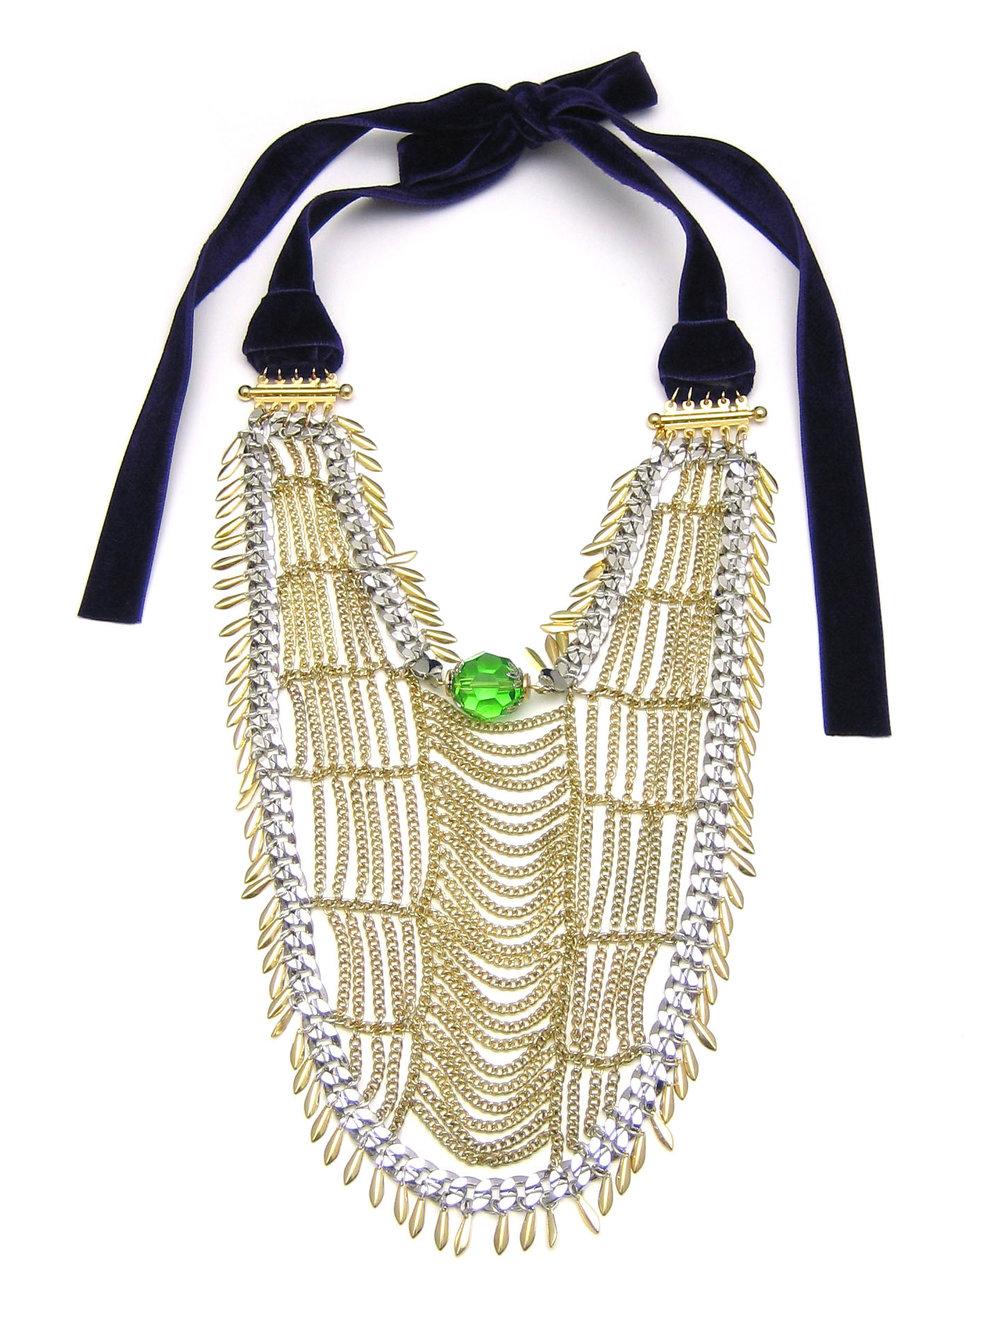 027 Gold Chain Weave Bib.jpg